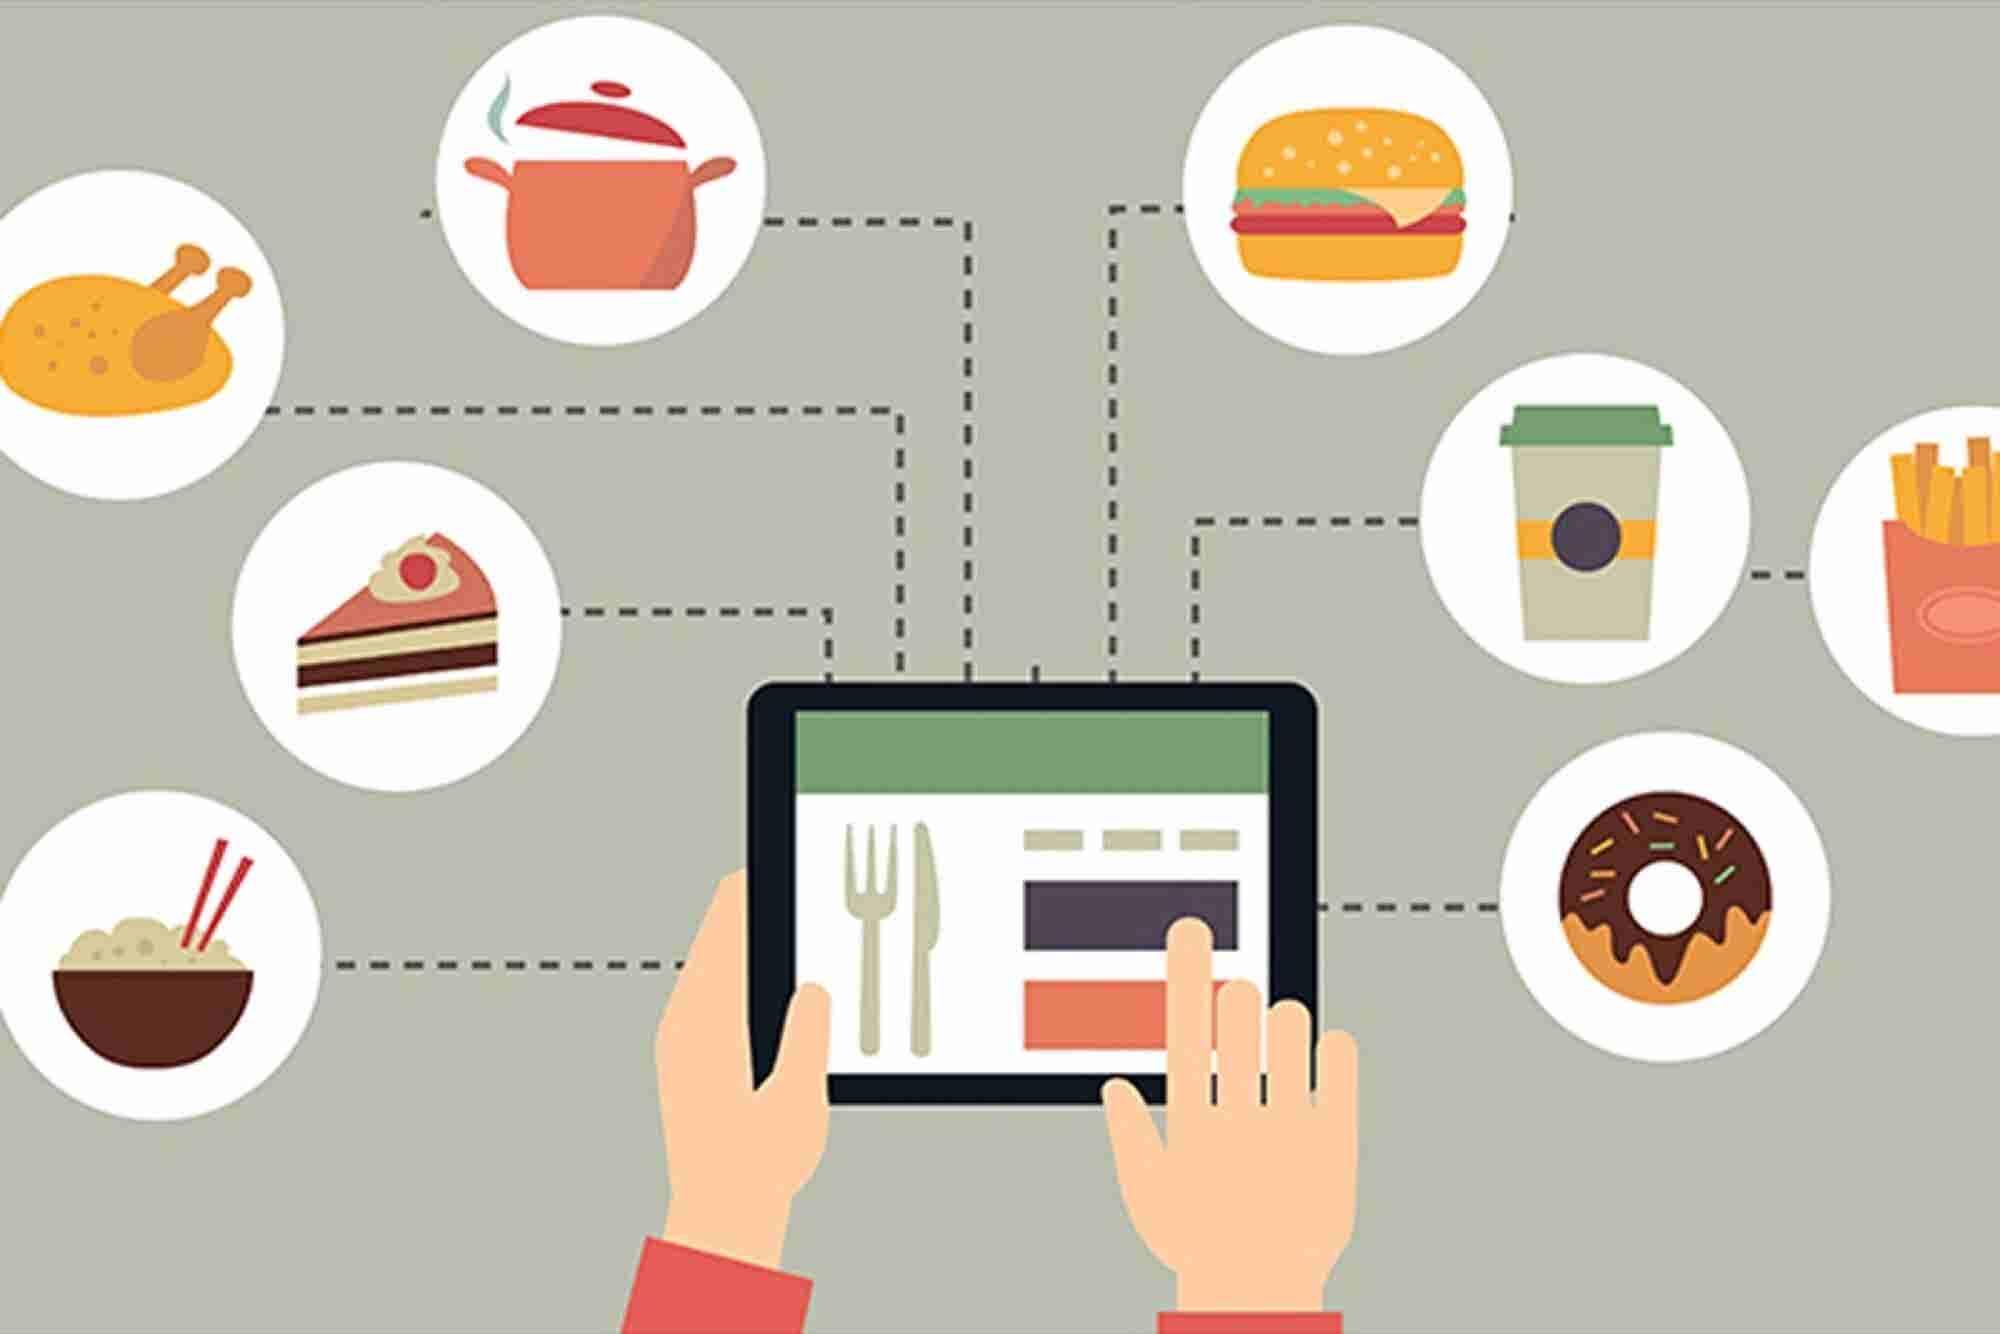 How food-tech can make money?